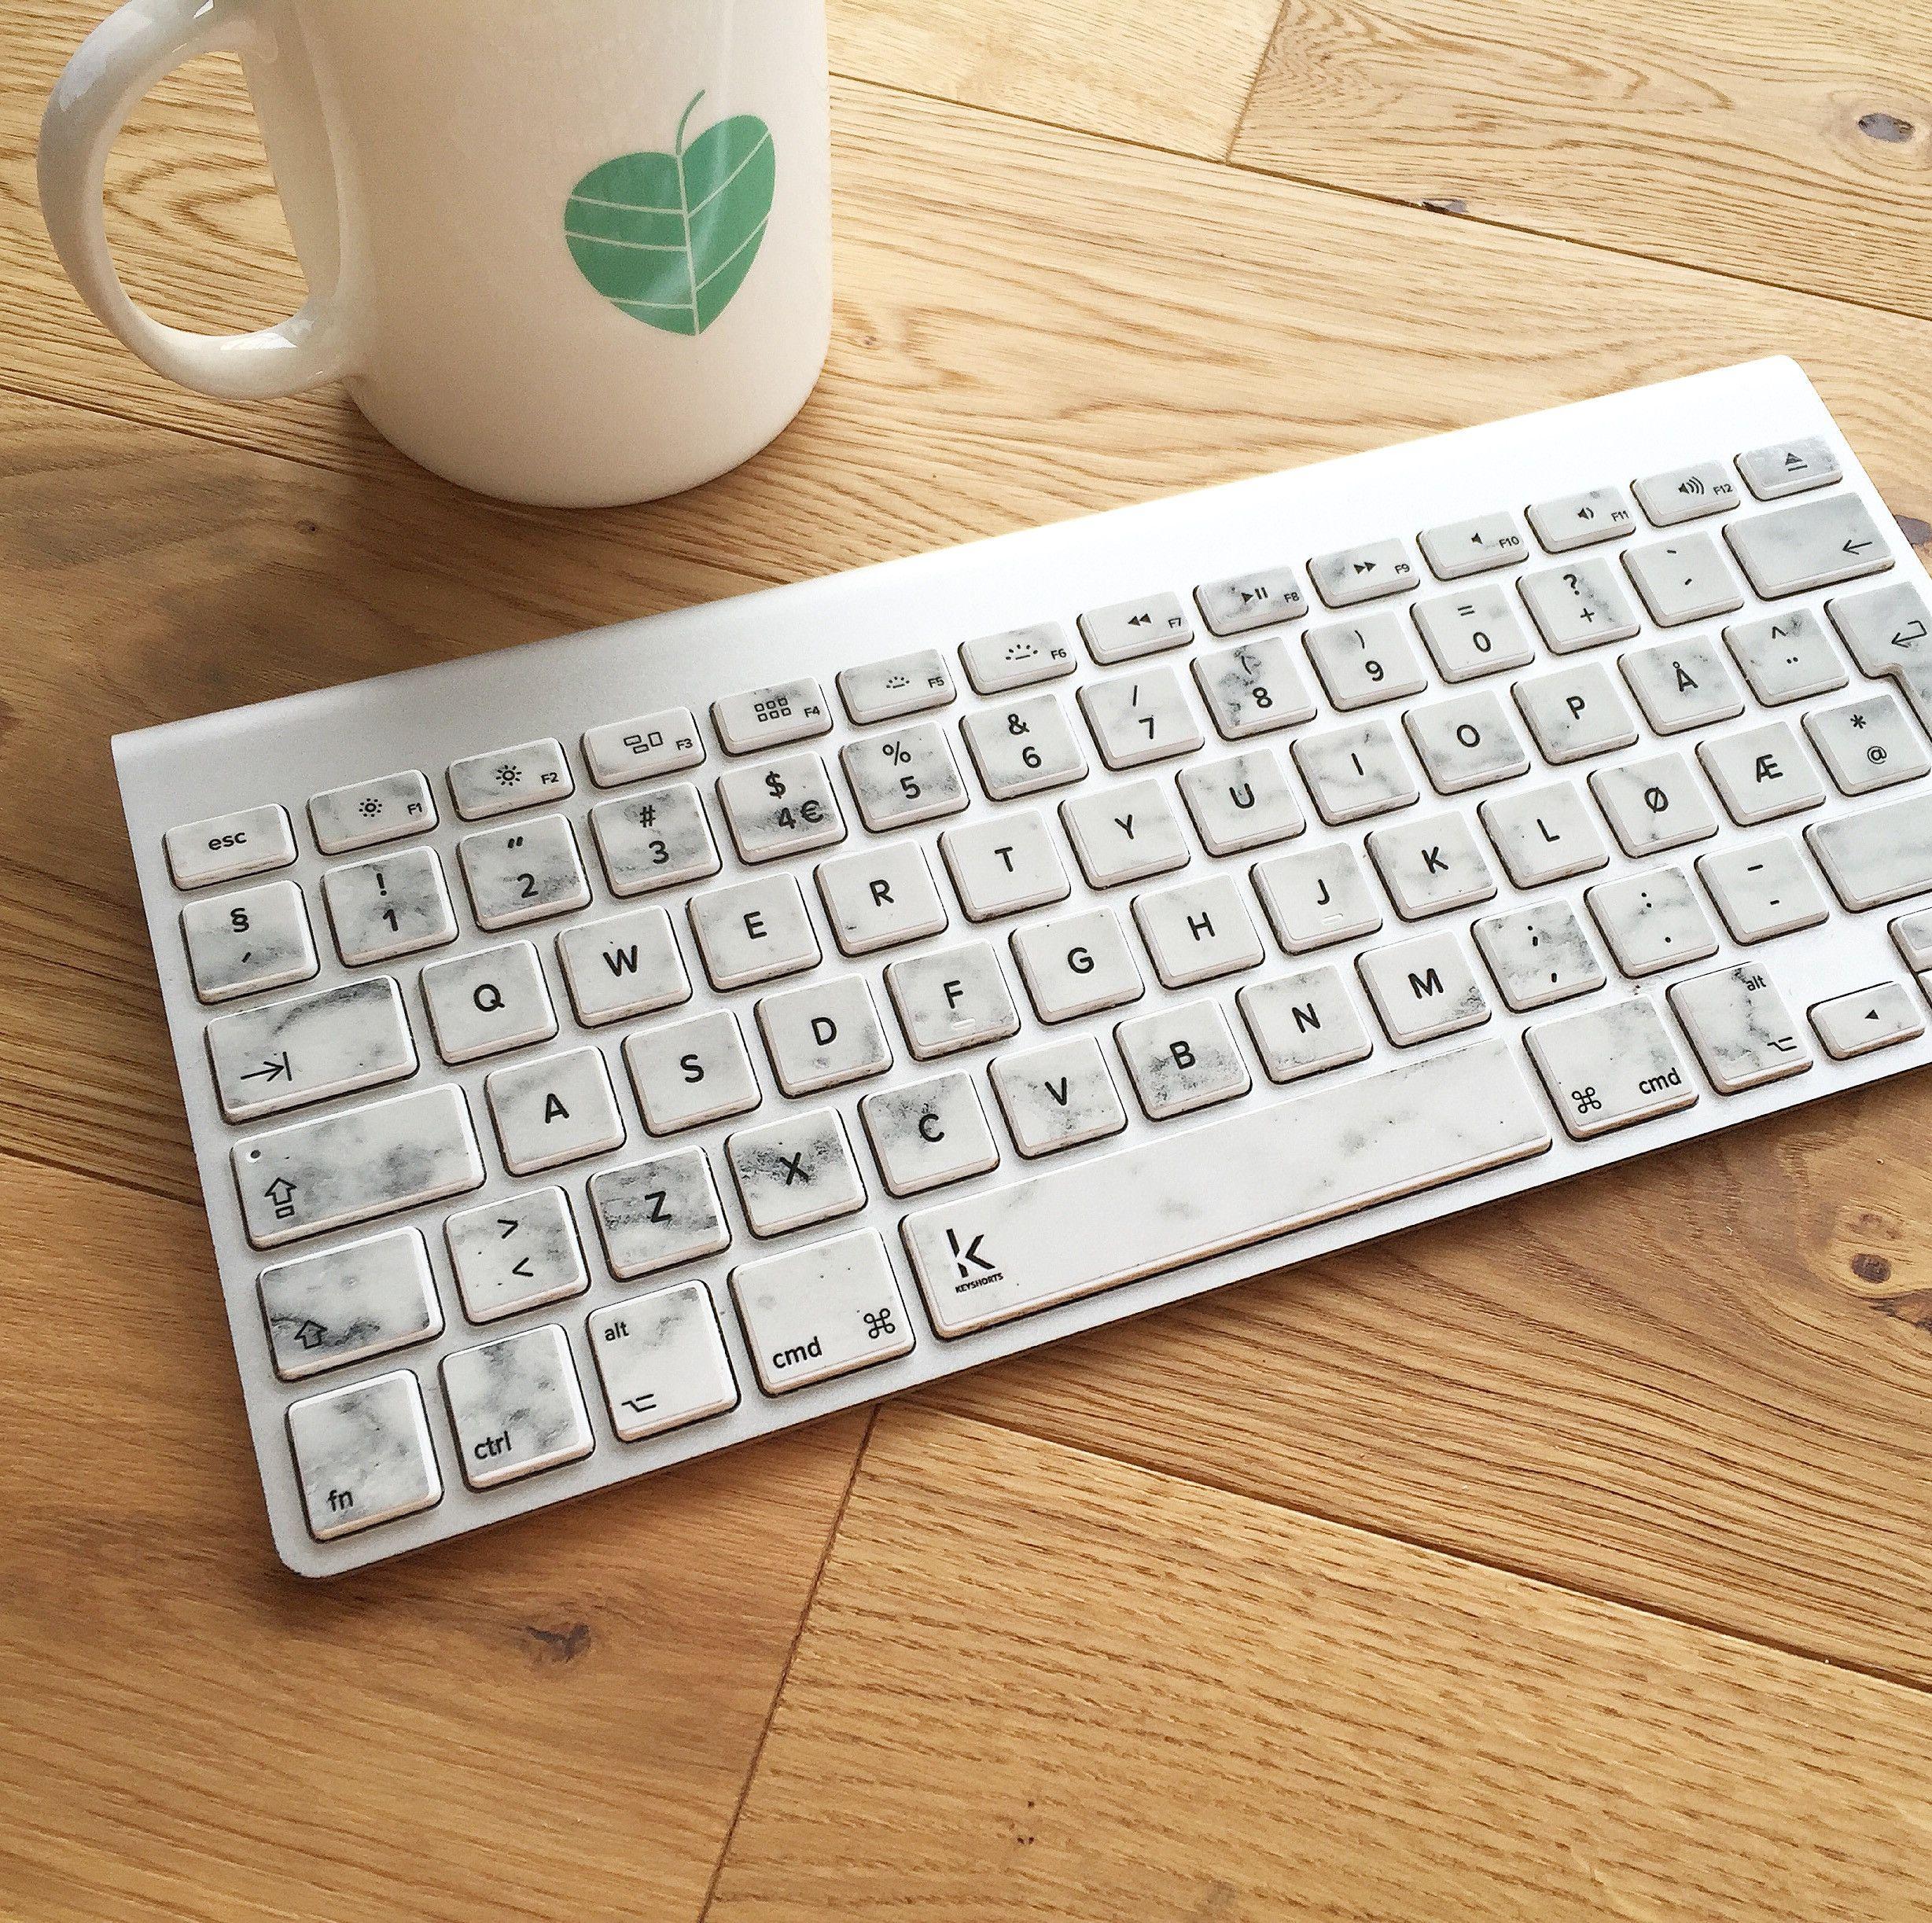 White Marble MacBook Keyboard Decal | Pinterest | Macbook keyboard ...